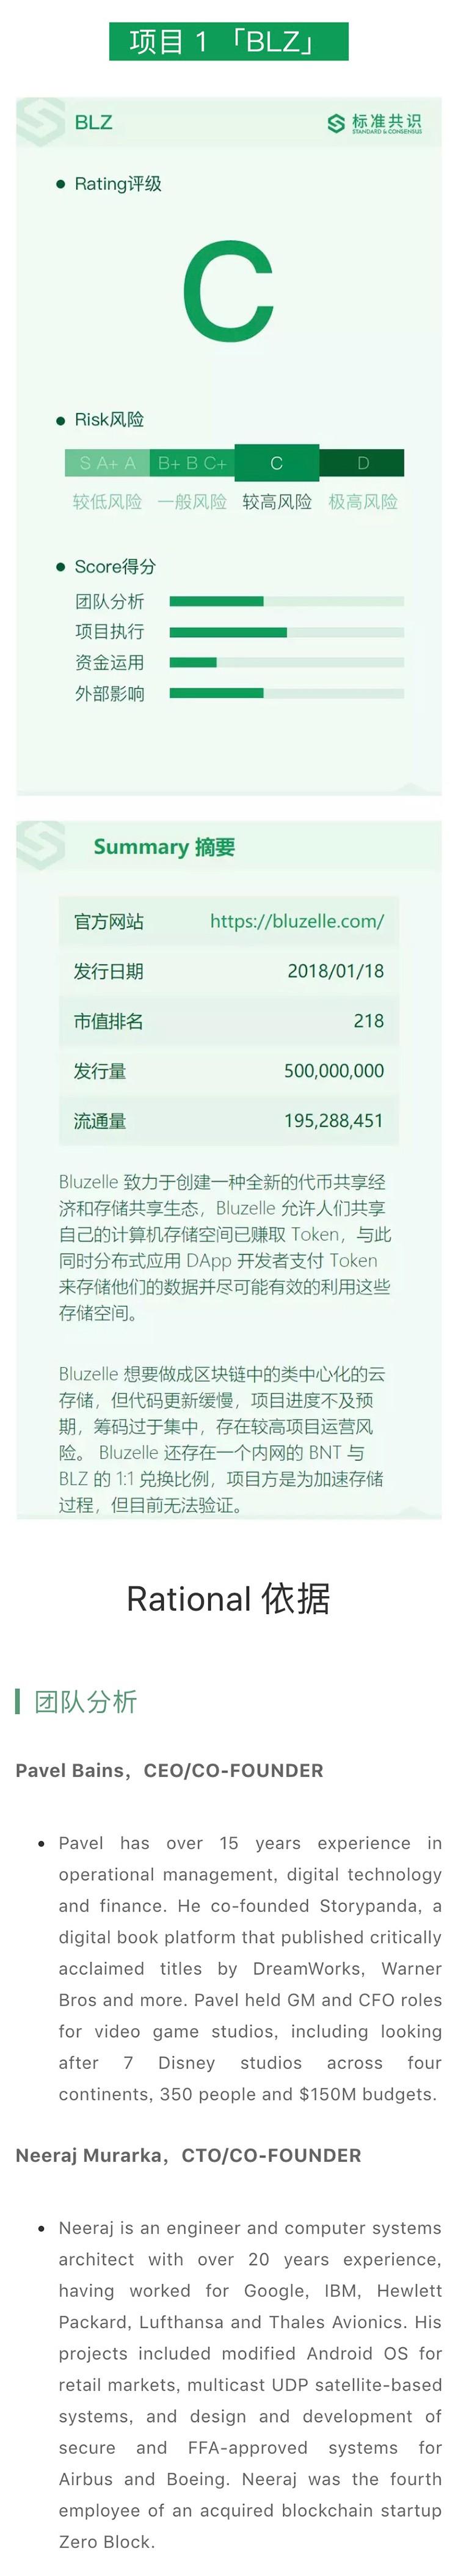 BLZ 用区块链技术建构分布式数据库,标准共识评级短报合集